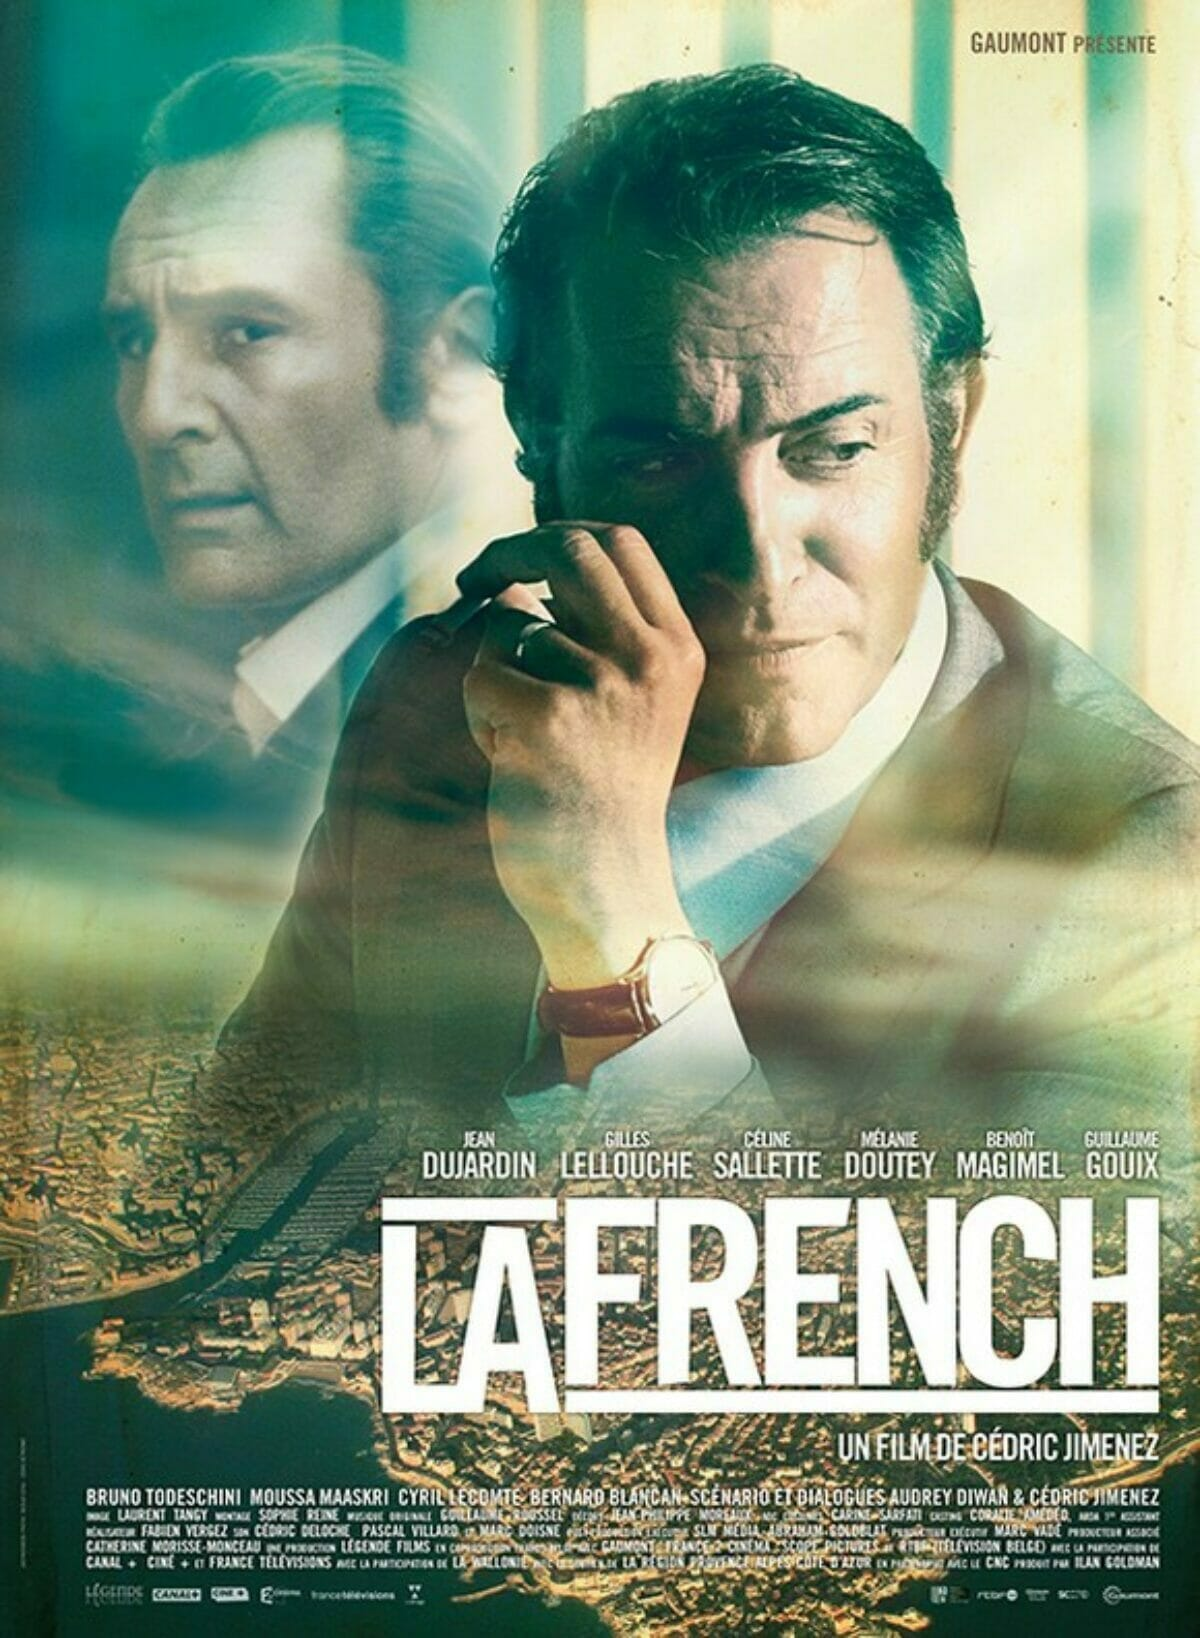 La-French-affiche-France